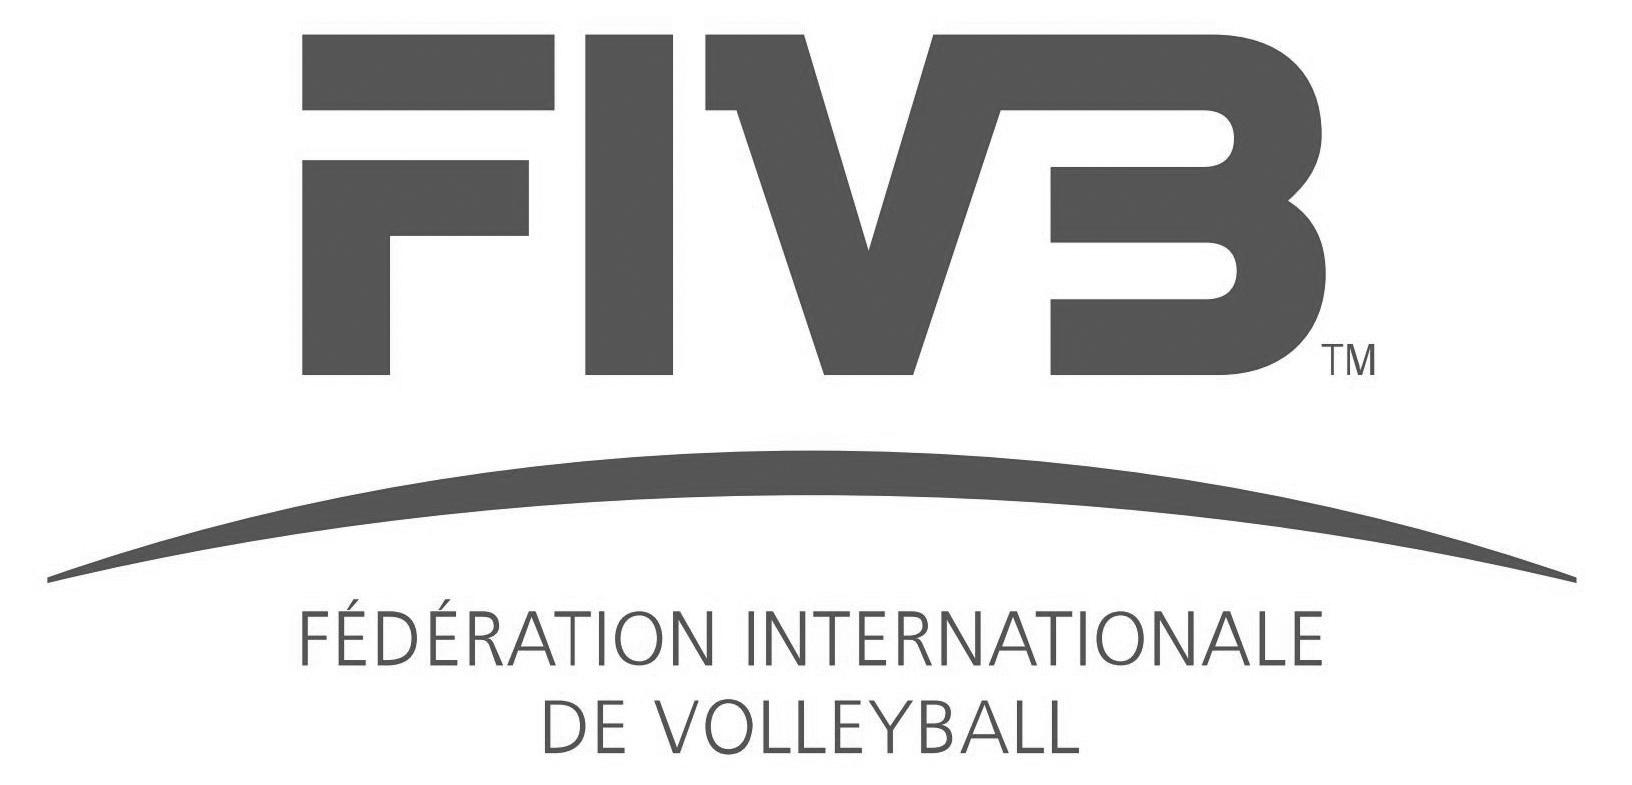 Federation-Internationale-de-Volleyball-FIVB-logo BW.jpg